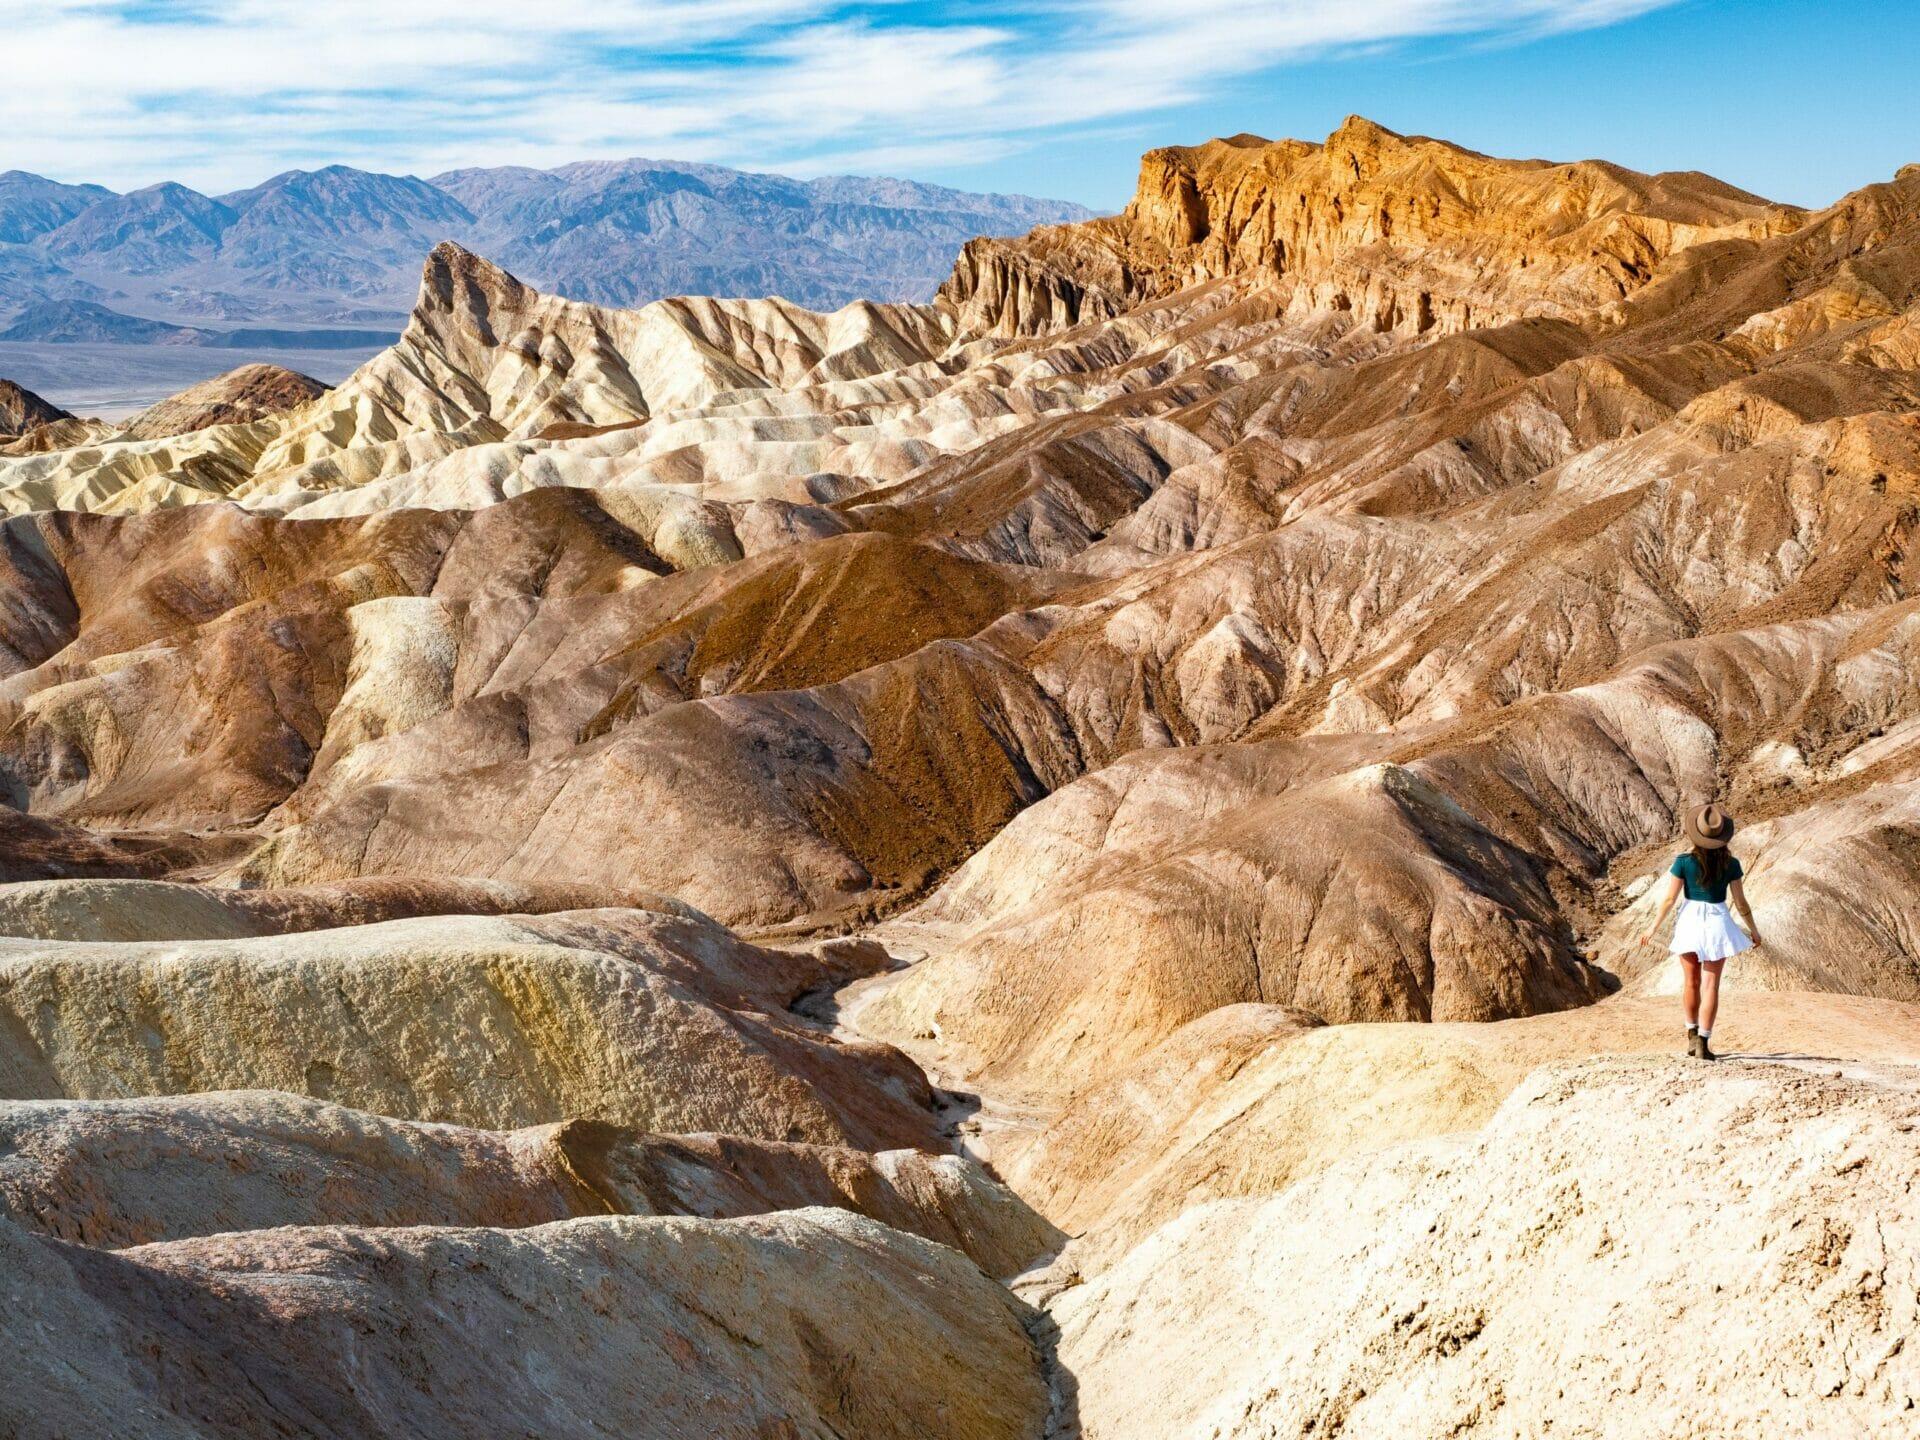 Zabriskie Point Death Valley National Park 1-day itinerary